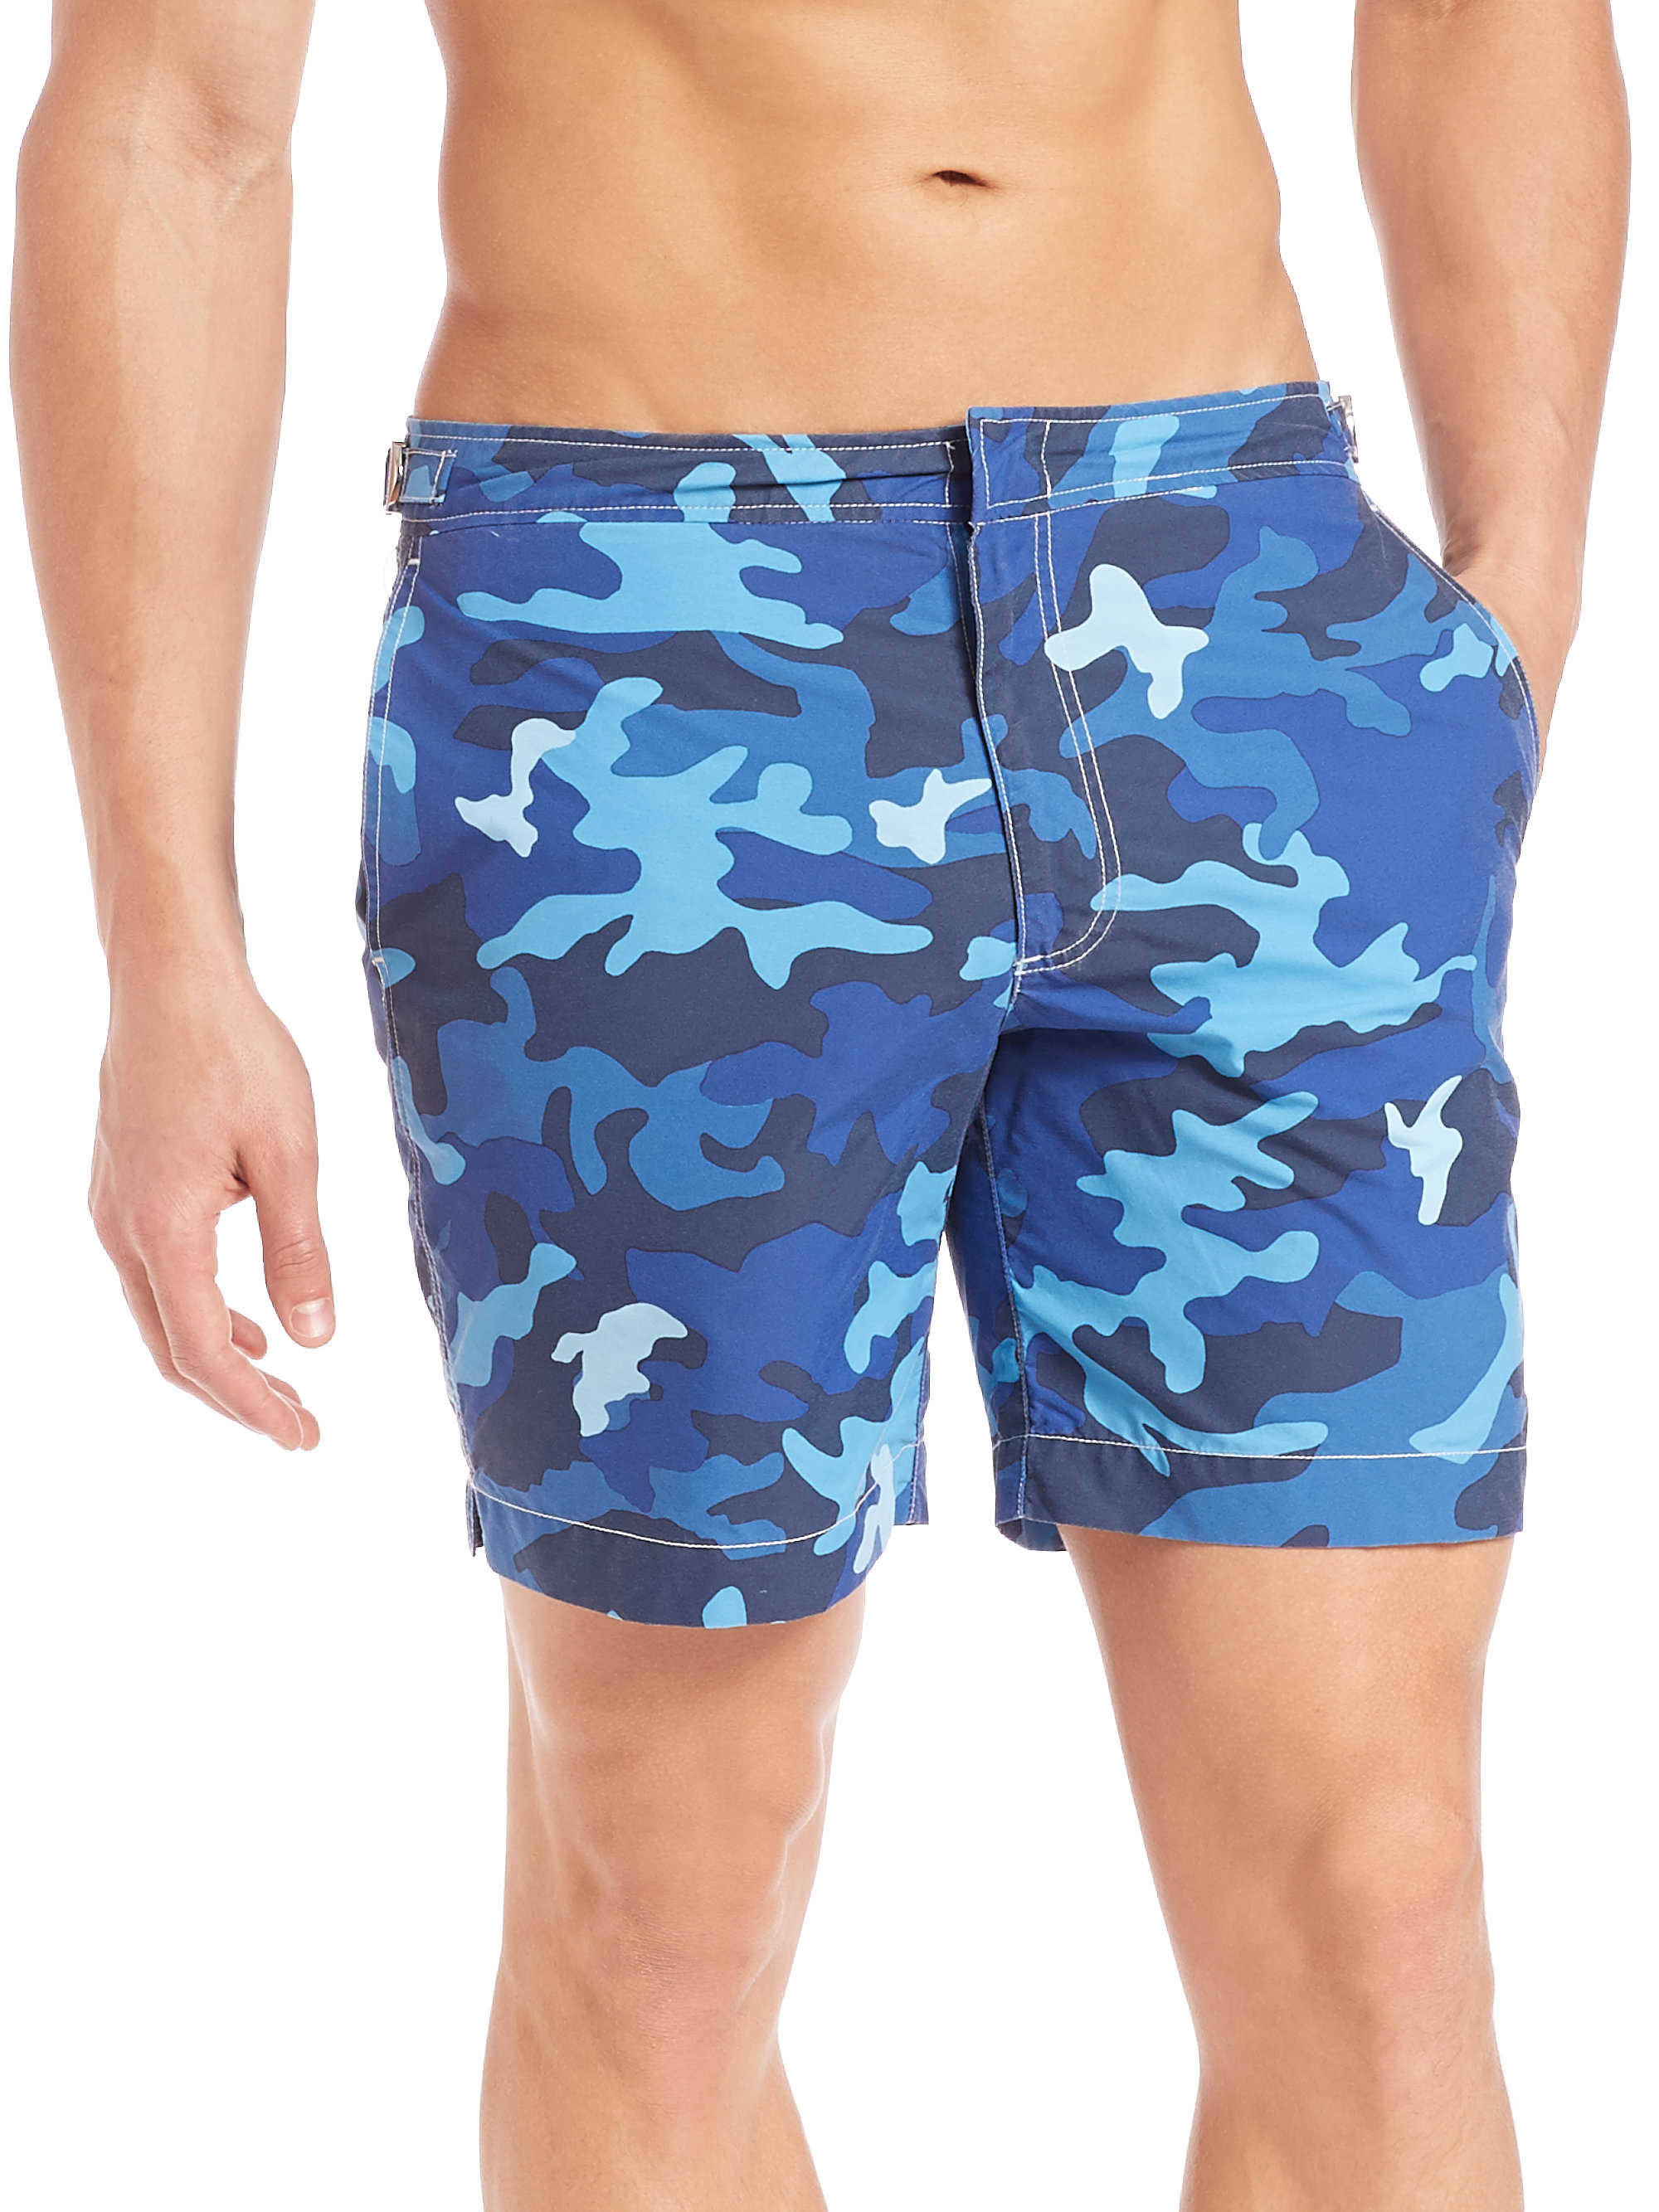 5d3e1a32b5 Polo Ralph Lauren Camo Monaco Swim Trunks in Blue for Men - Lyst